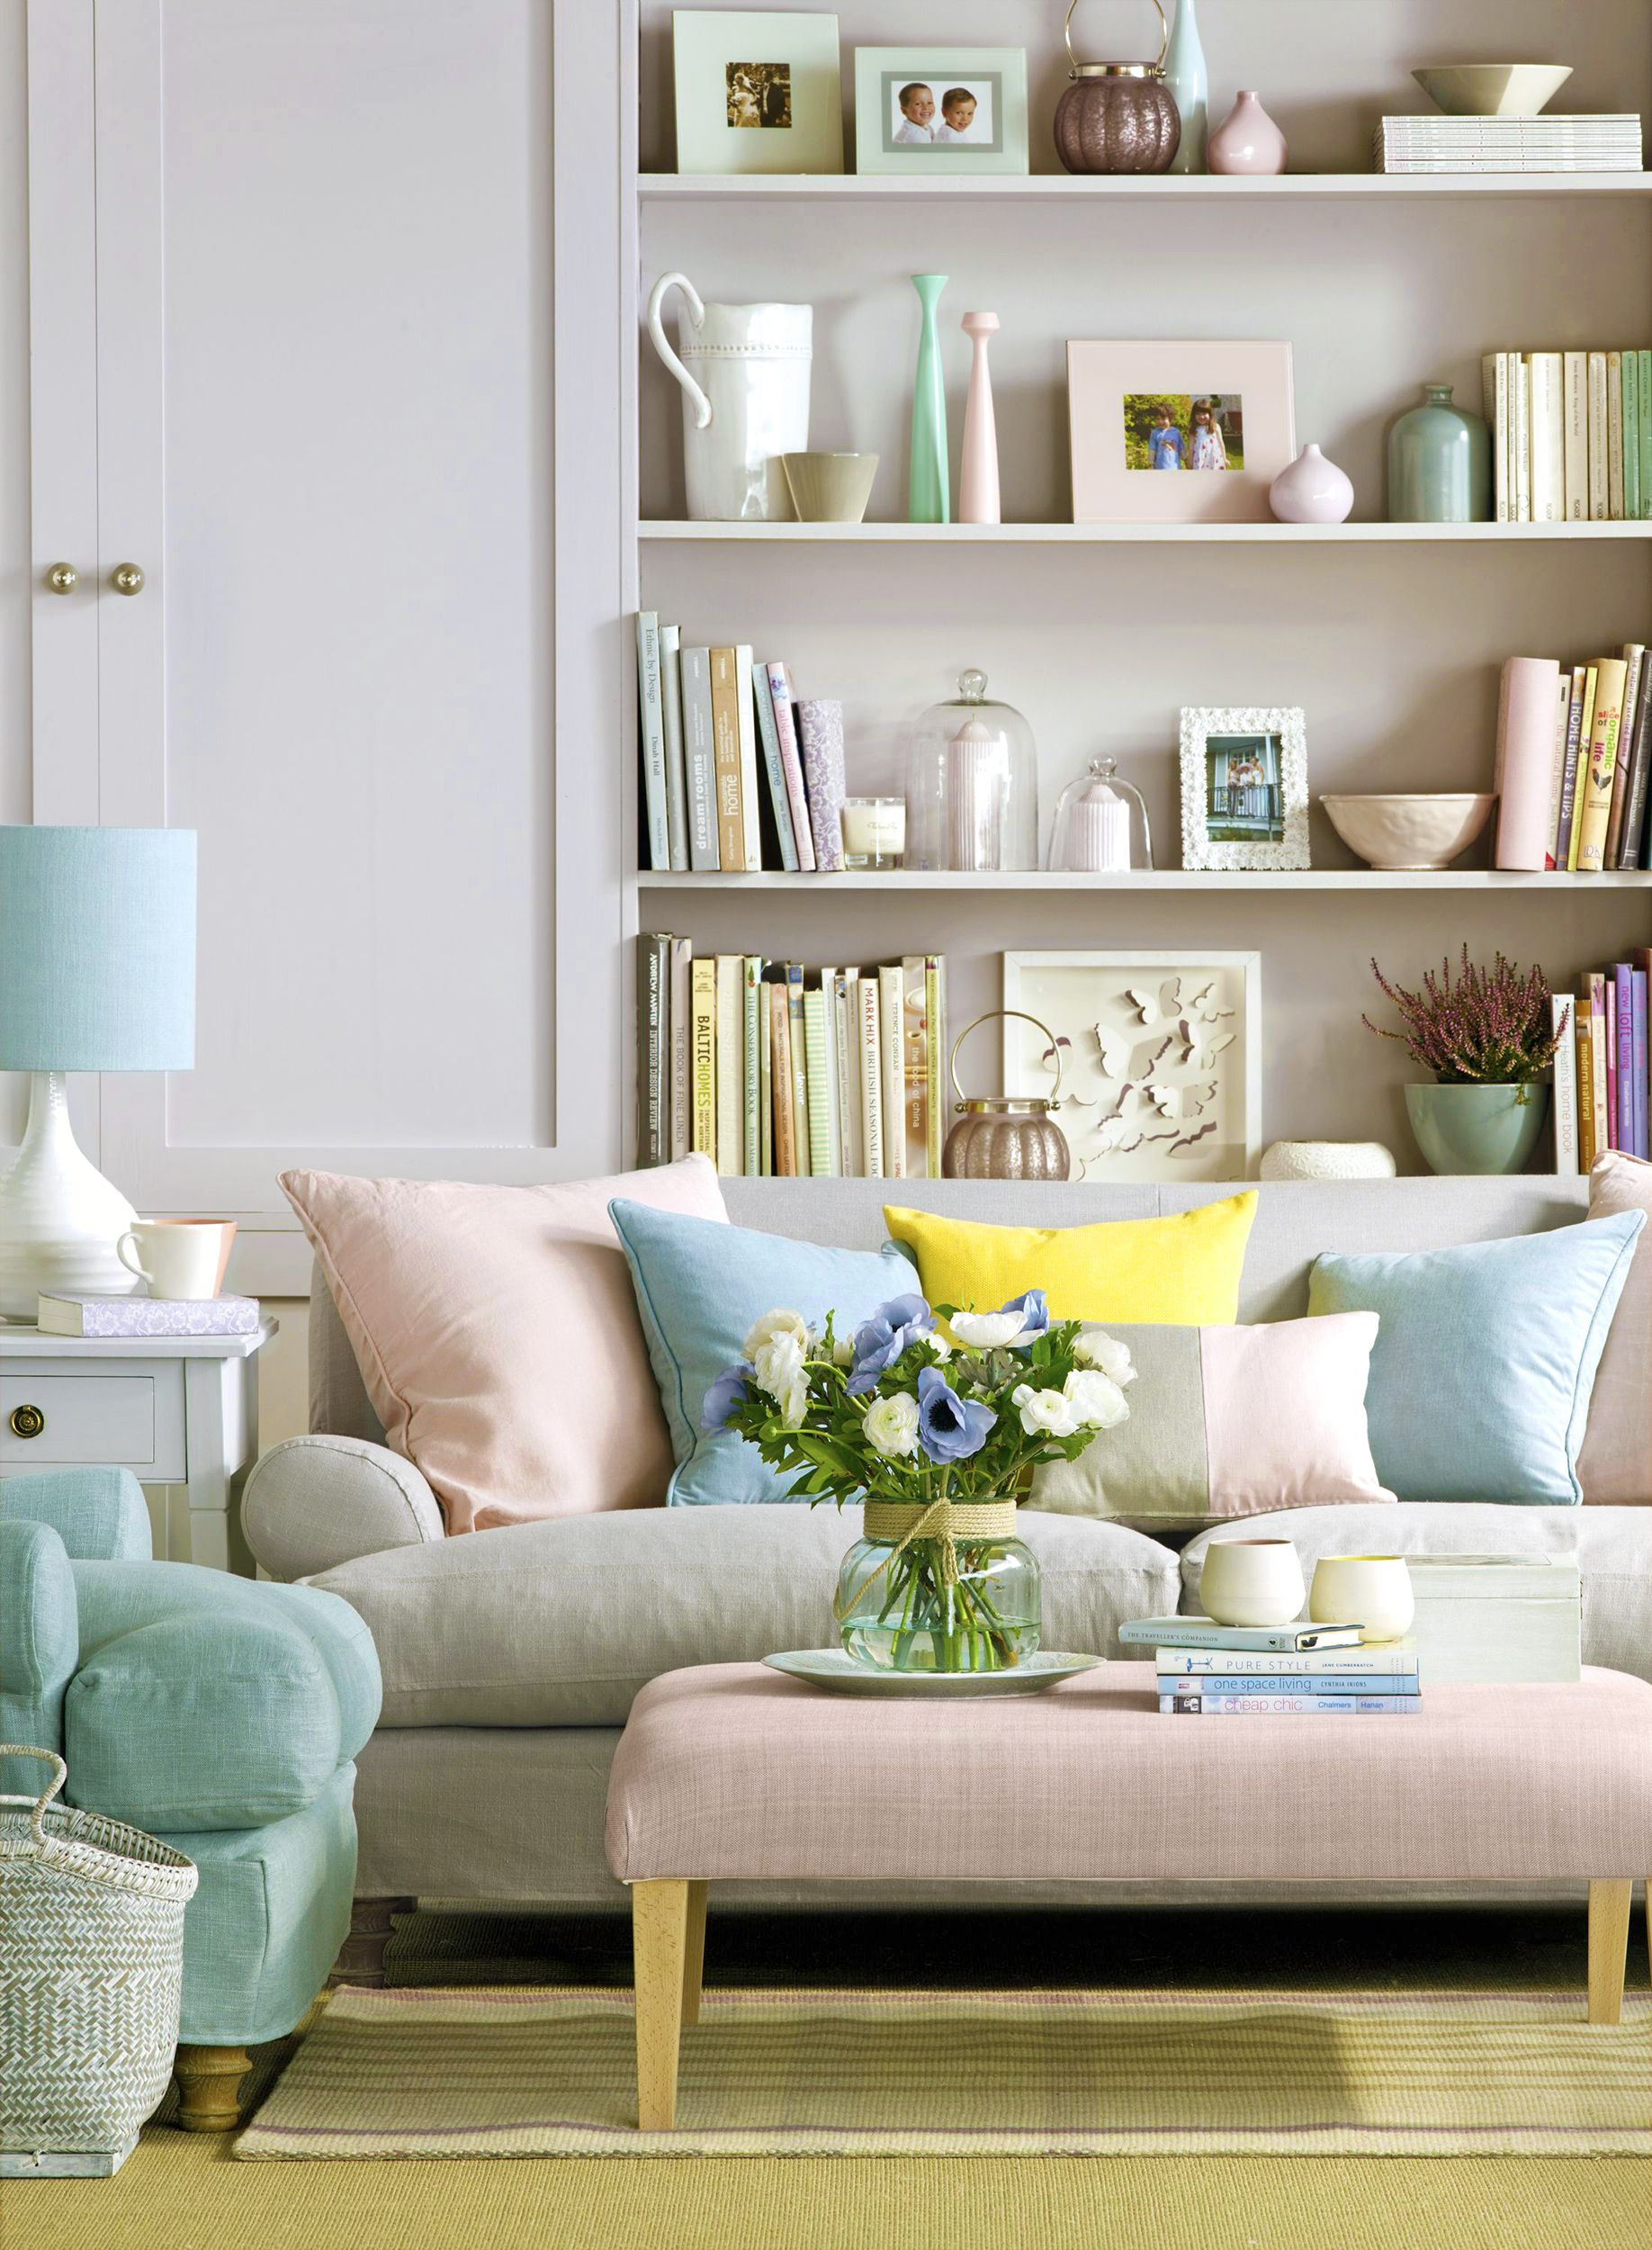 Spring Decor Ideas - Pastel Living Room